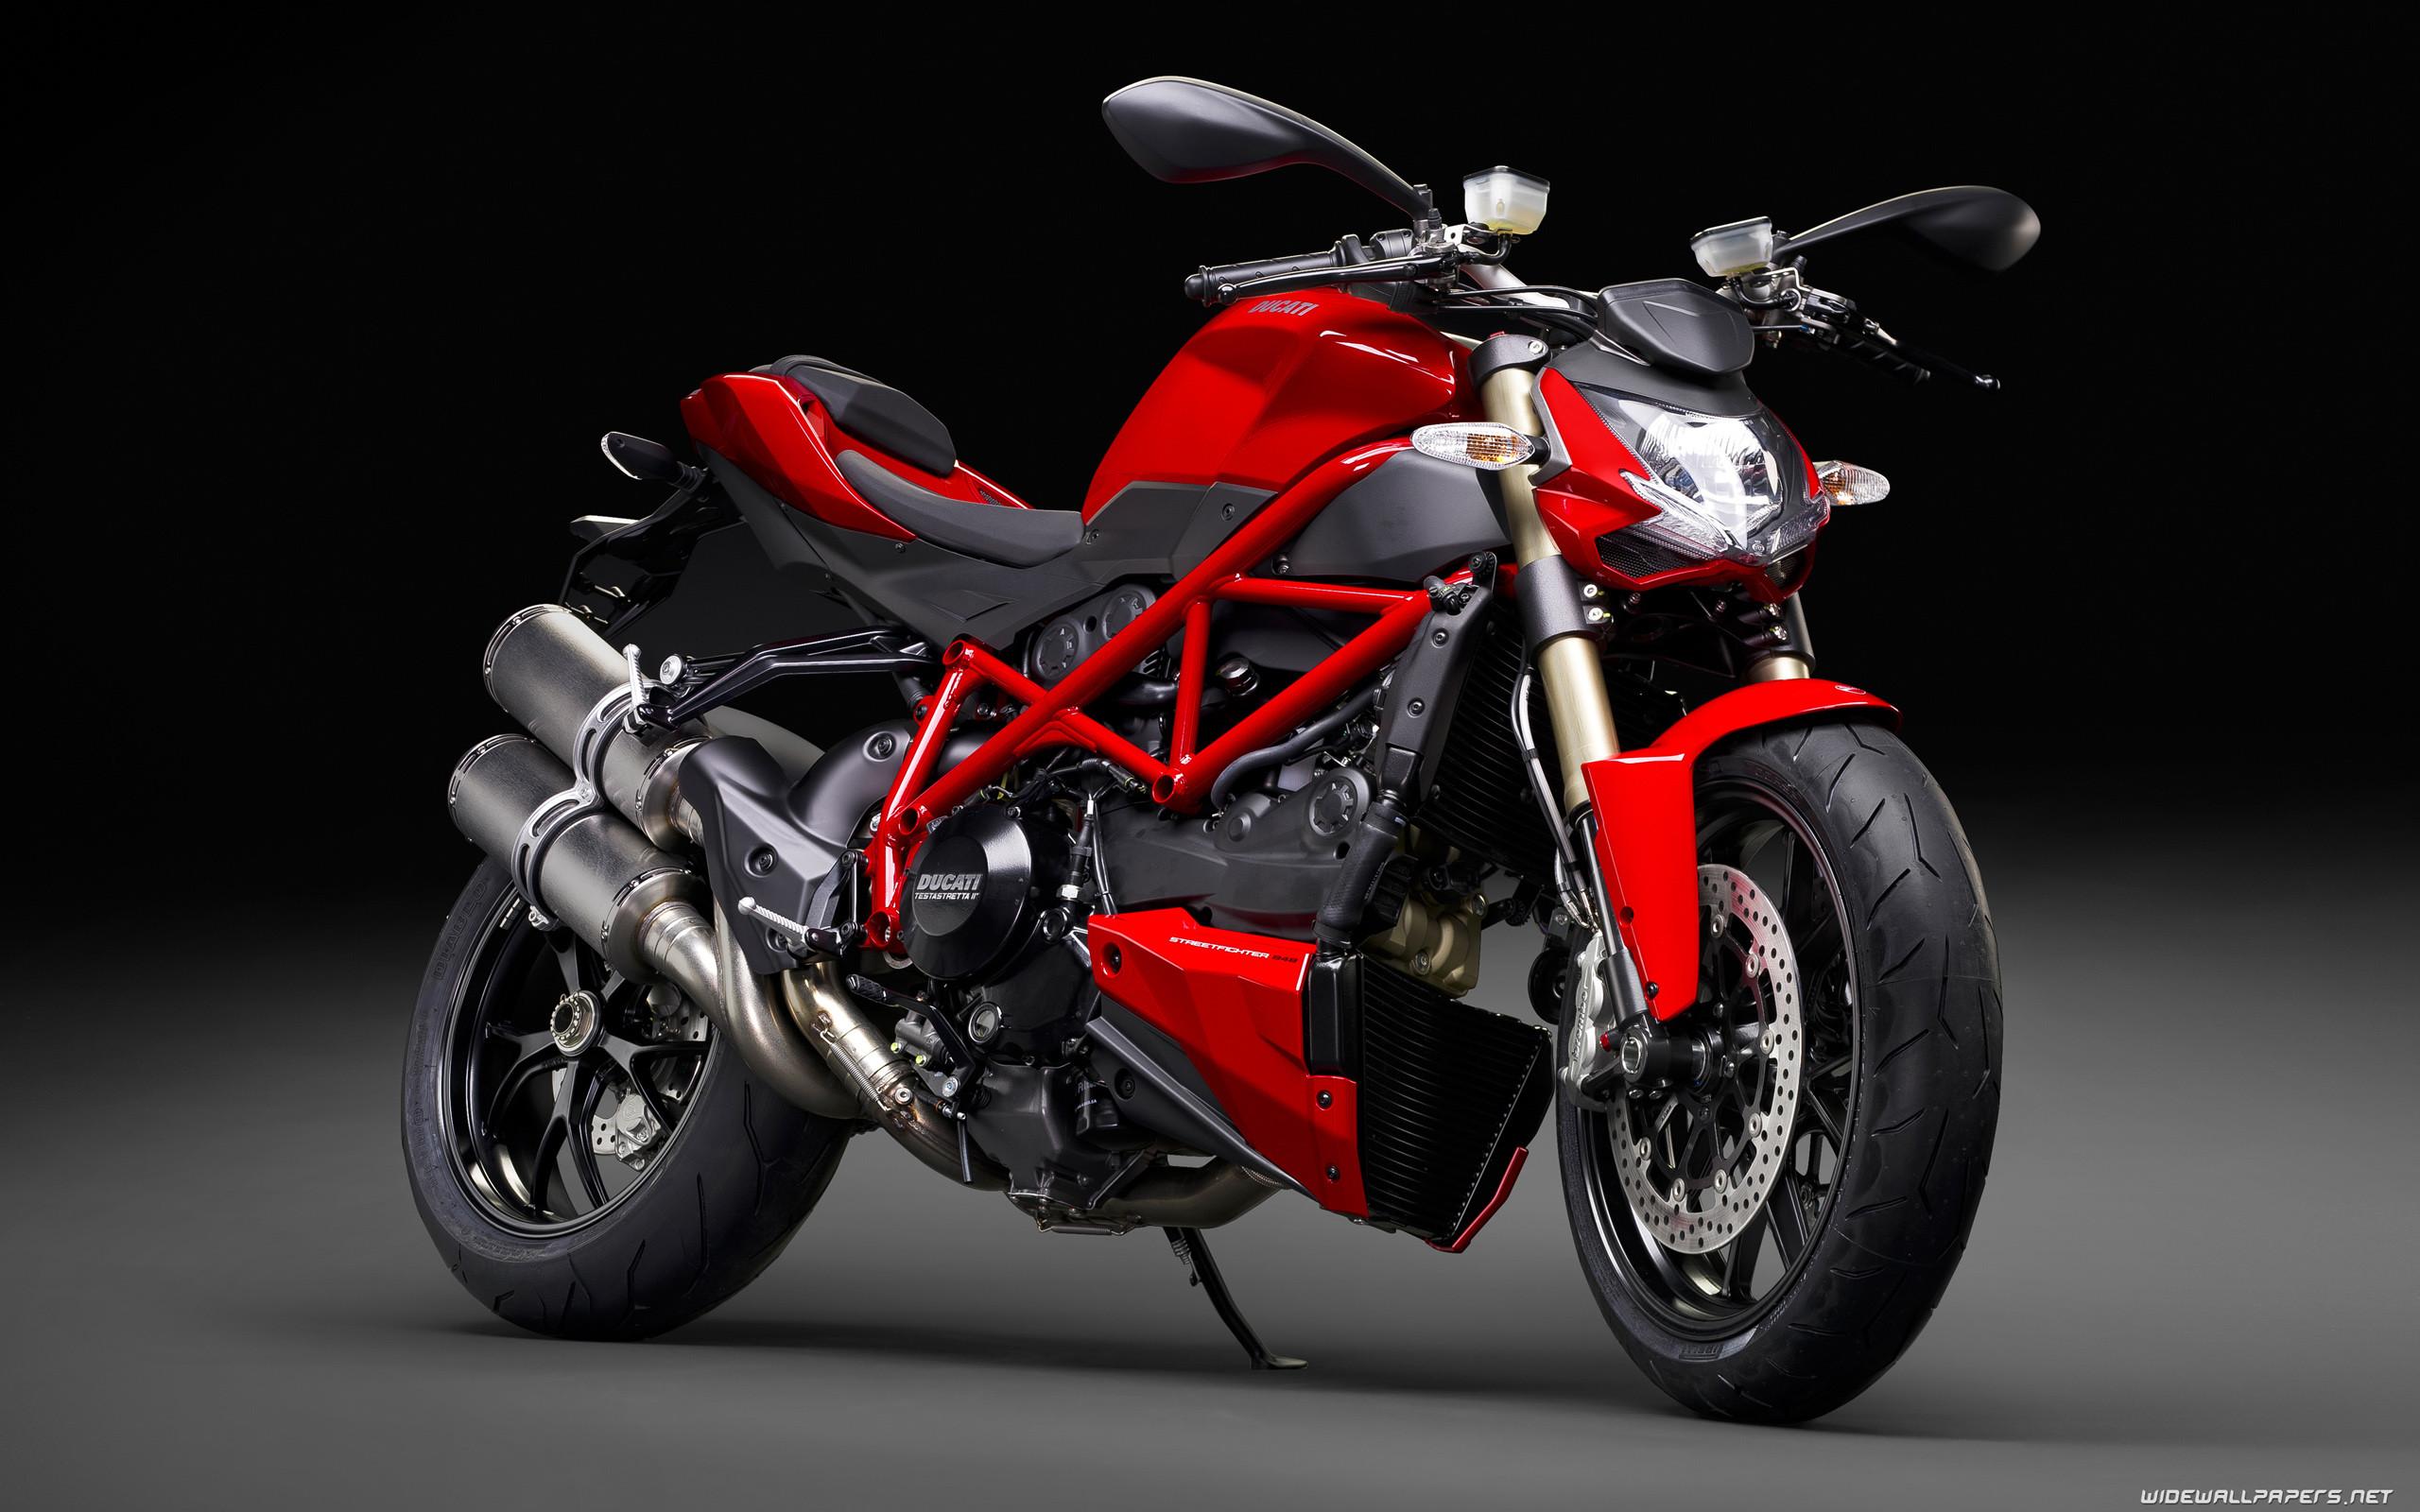 Ducati Streetfighter 848 motorcycle wallpapers 4K Ultra HD Ducati  Streetfighter 848 motorcycle 2560×1440 3840×2160